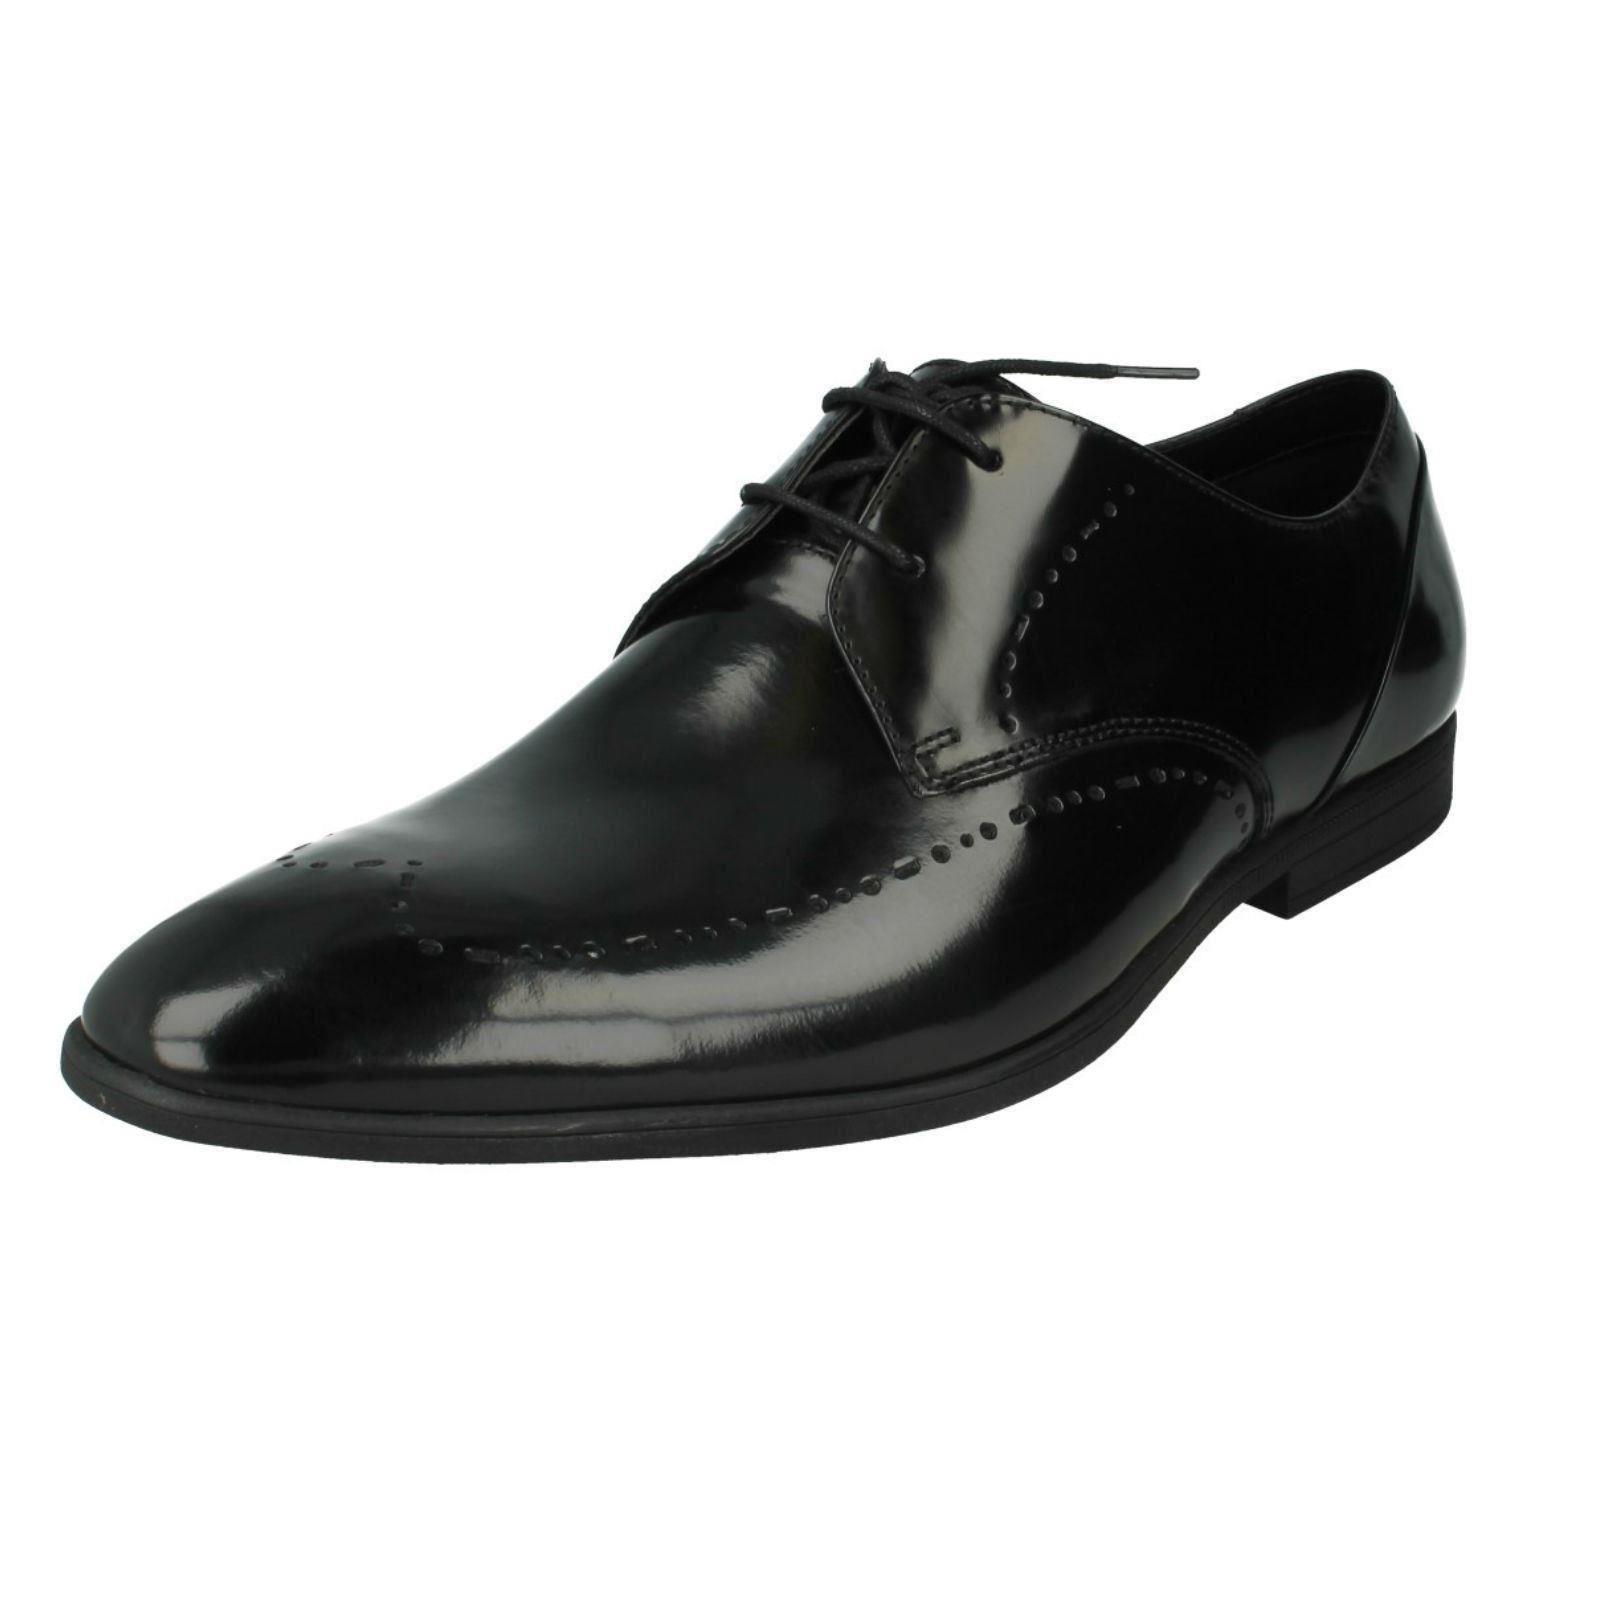 Men-039-s-Clarks-Formal-Lace-Up-Shoes-